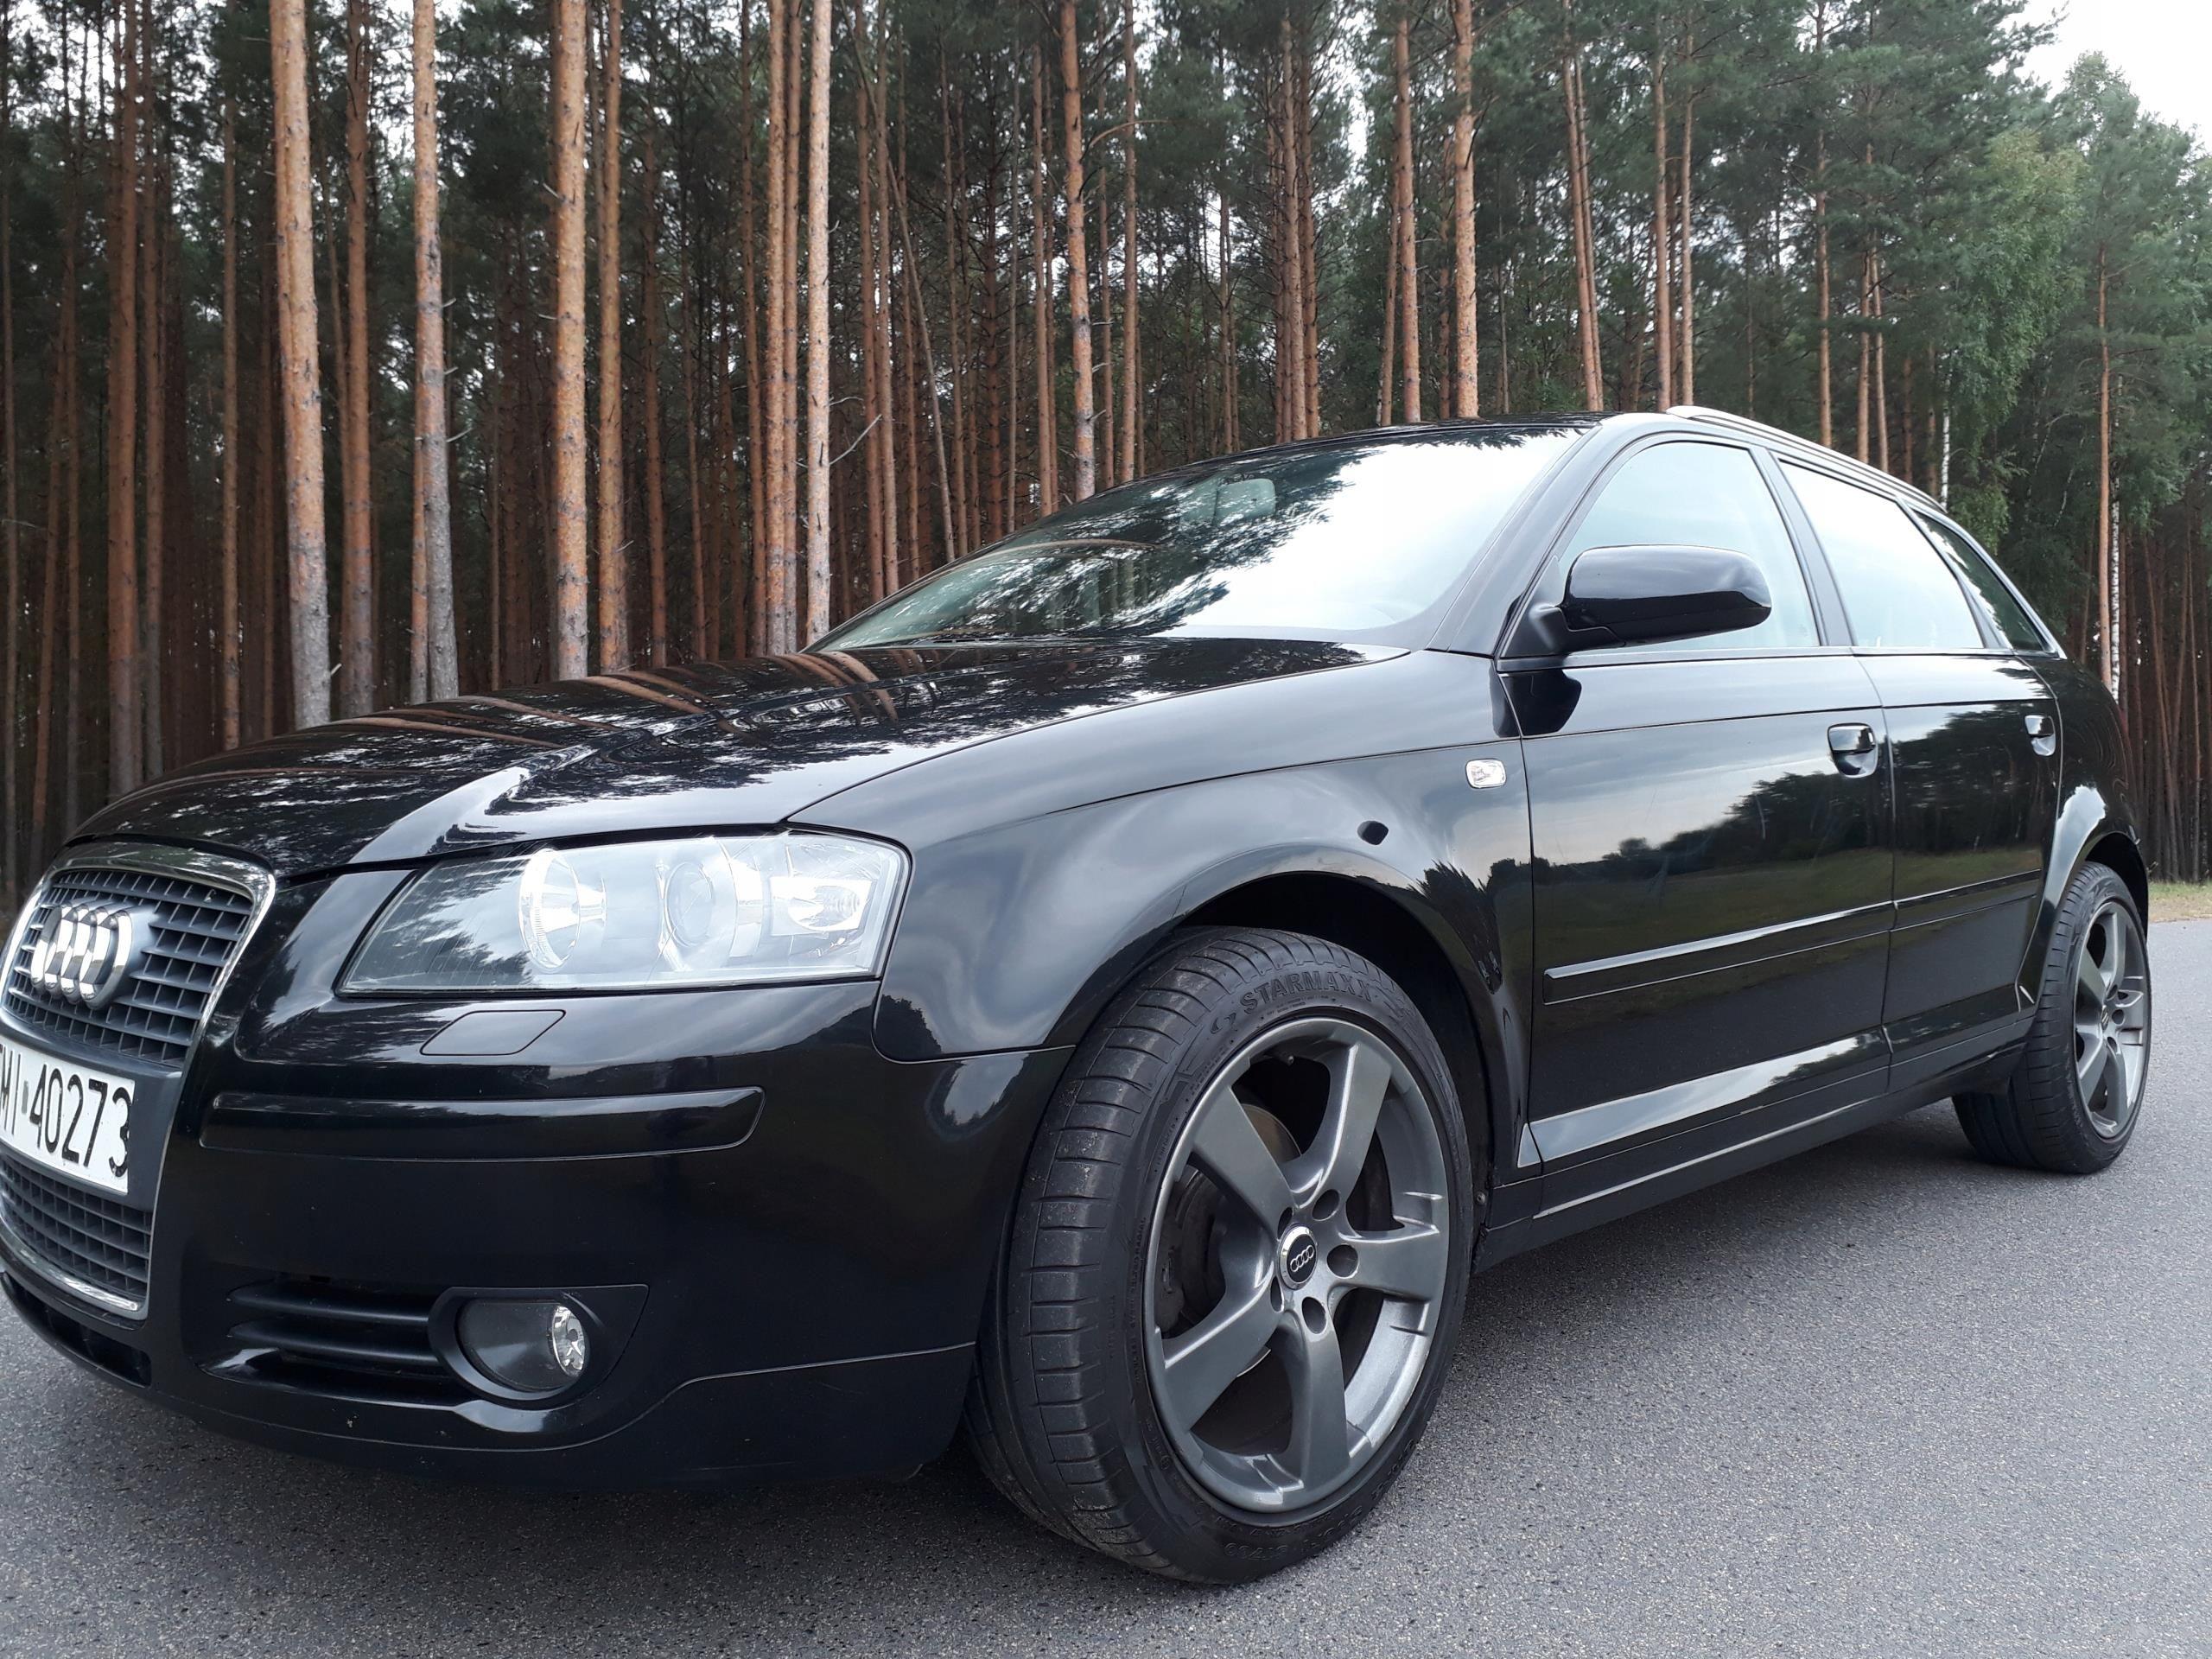 Audi A3 8p Sportback 19 Tdi Navixenonwebasto Opinie I Ceny Na